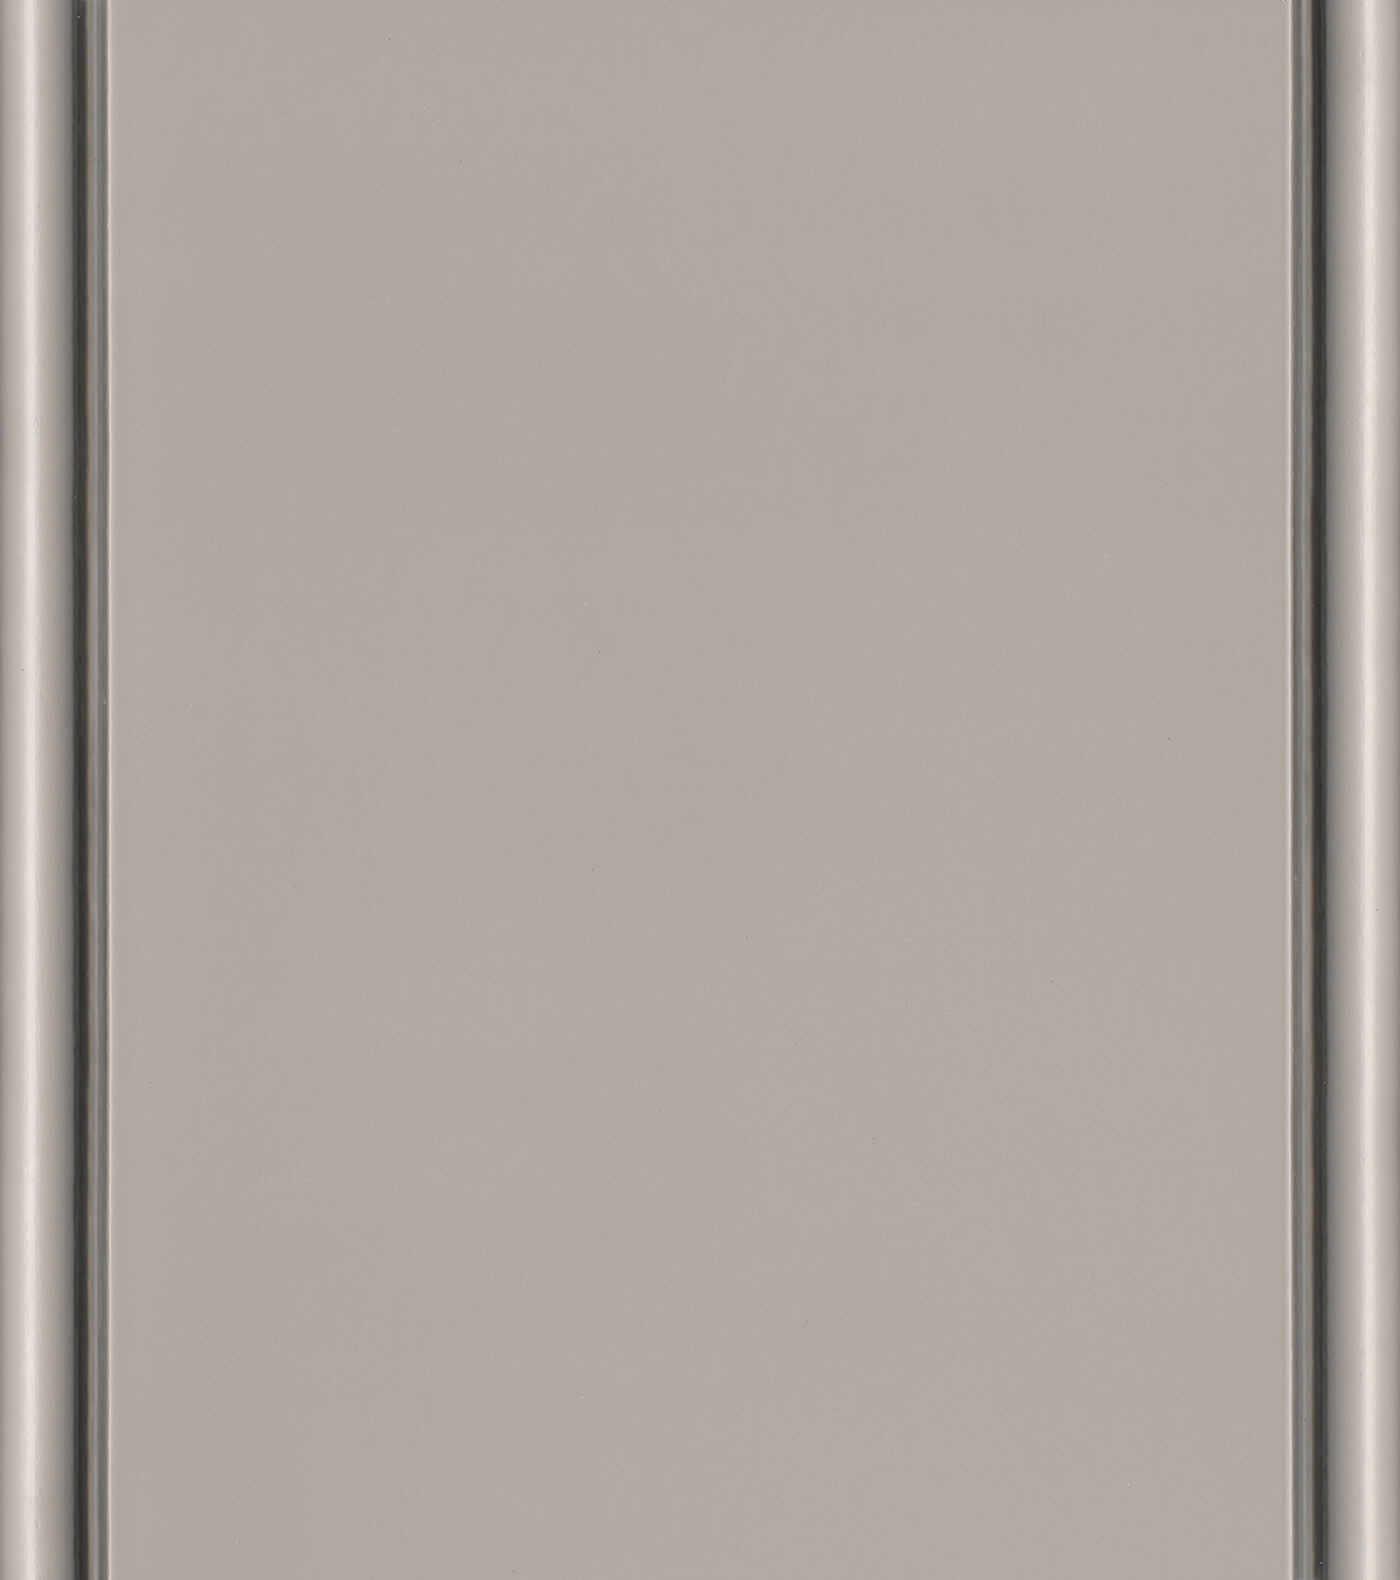 Cashmere / Slate Paint / Accent Finish on Paintable